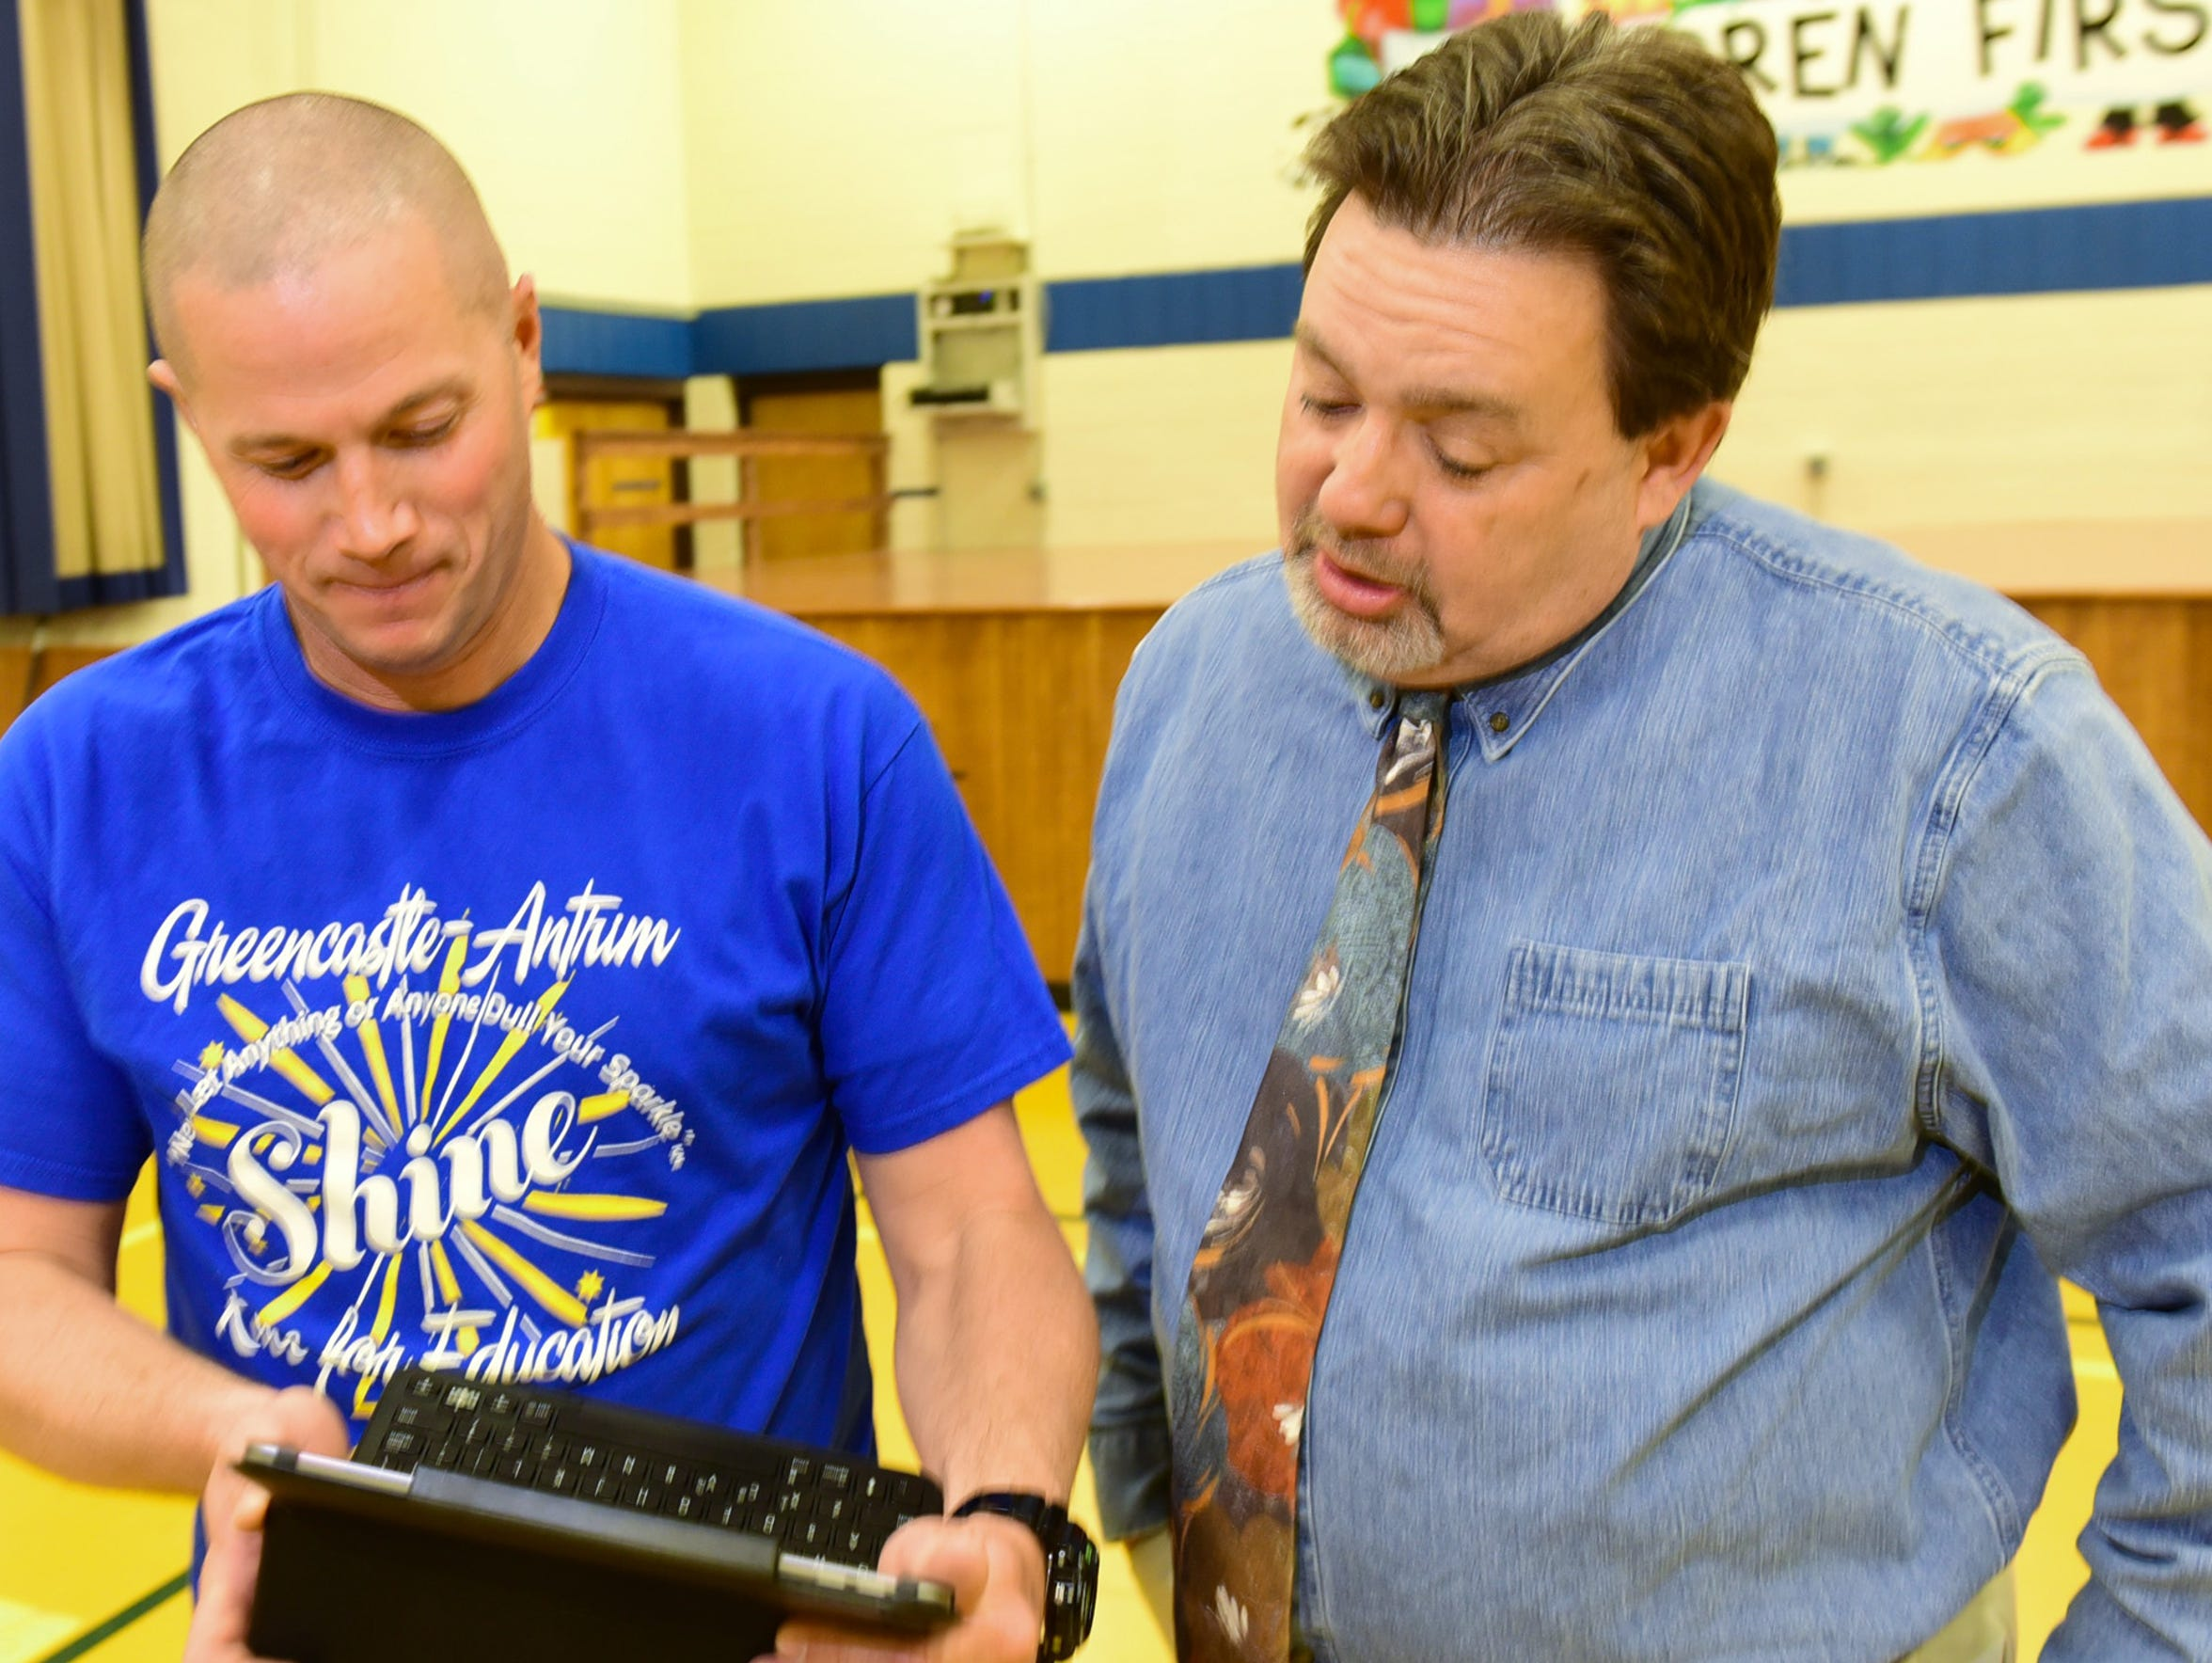 Greg Hoover, right, Greencastle-Antrim School District